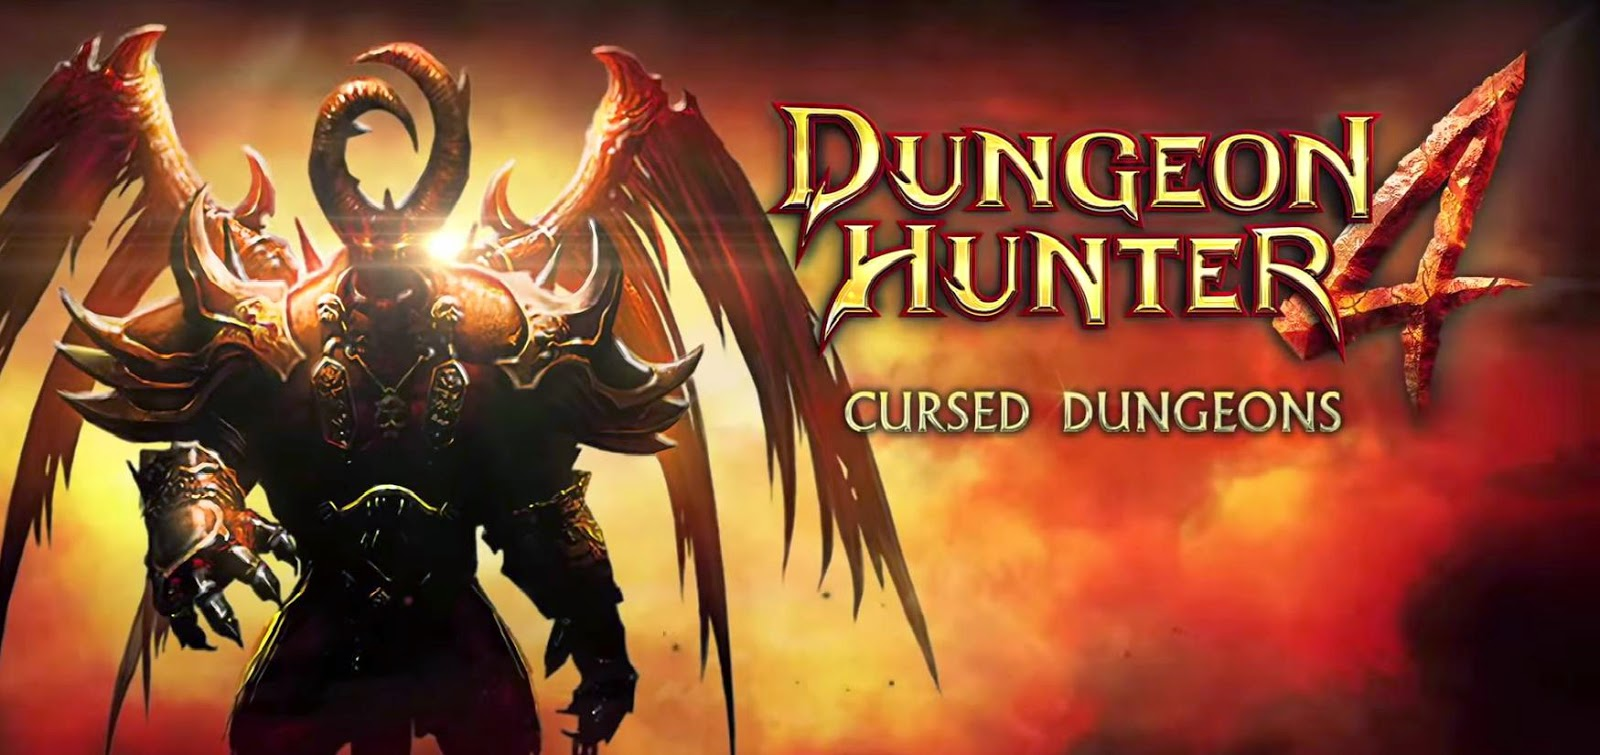 Dungeon Hunter 4 1.8.0 MOD APK+DATA (Unlimited Money)